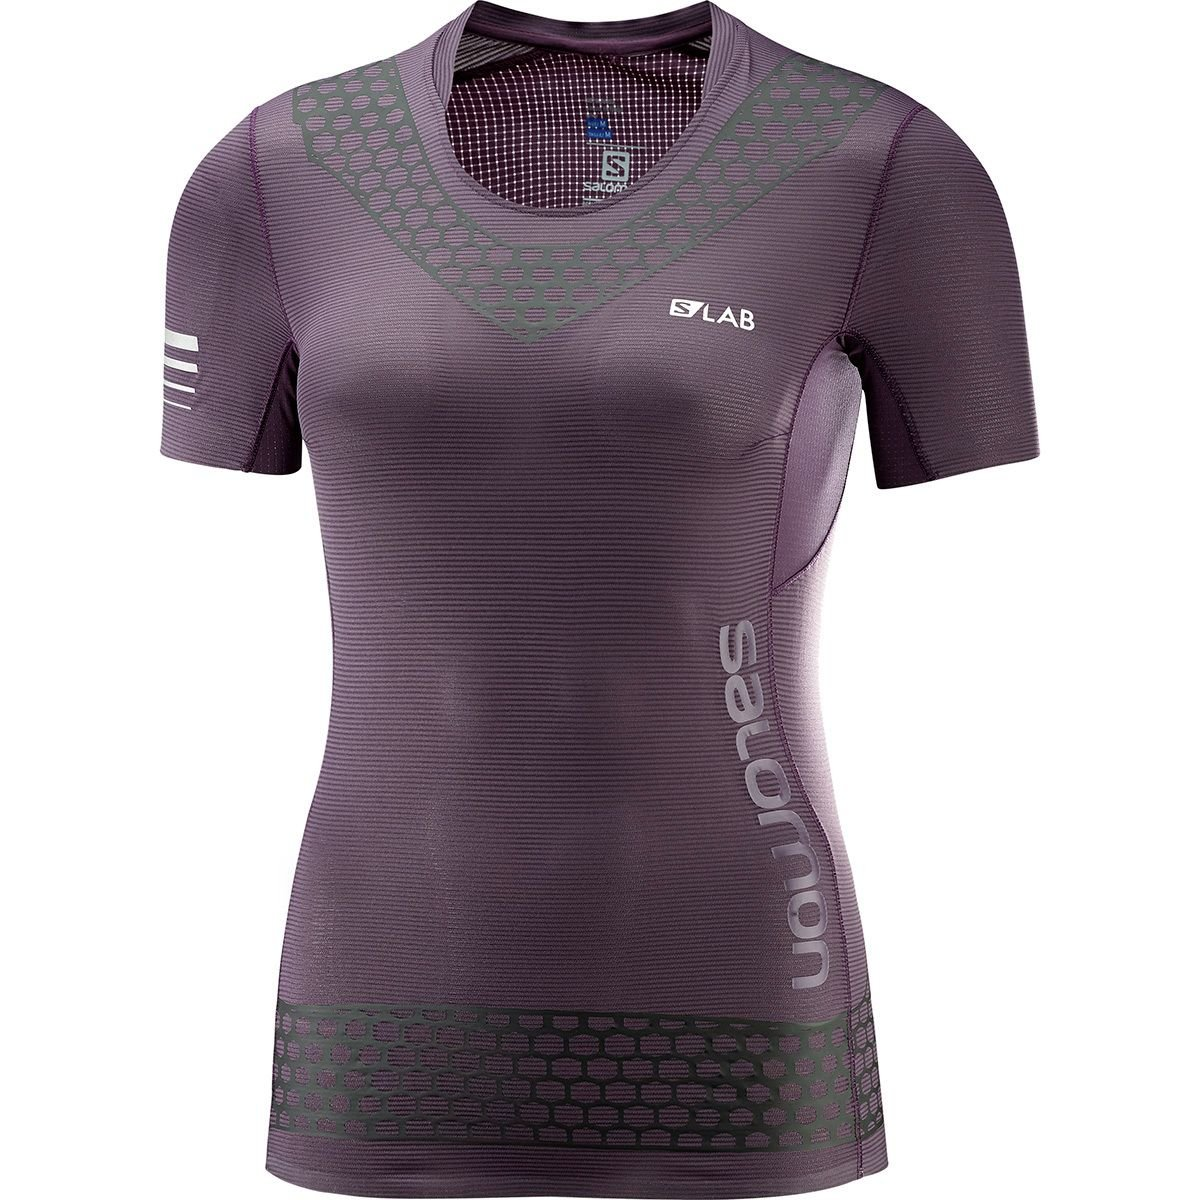 Salomon Women's S-Lab EXO Short Sleeve T-Shirt, Maverick, S